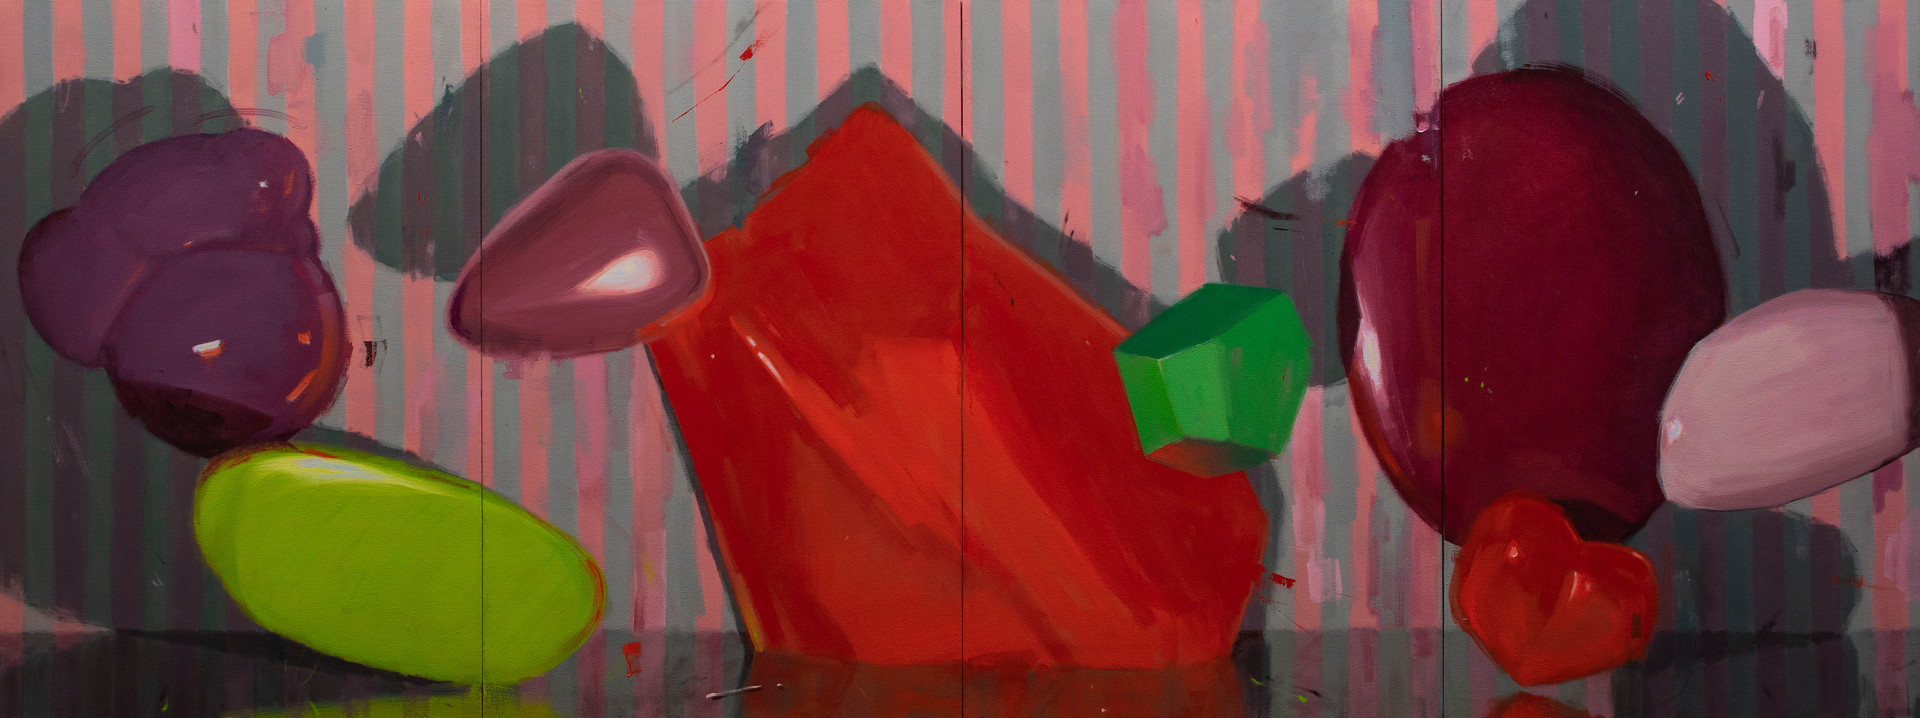 Thingspan (quadriptych), 2020, oil on canvas, 75 x 200 cm